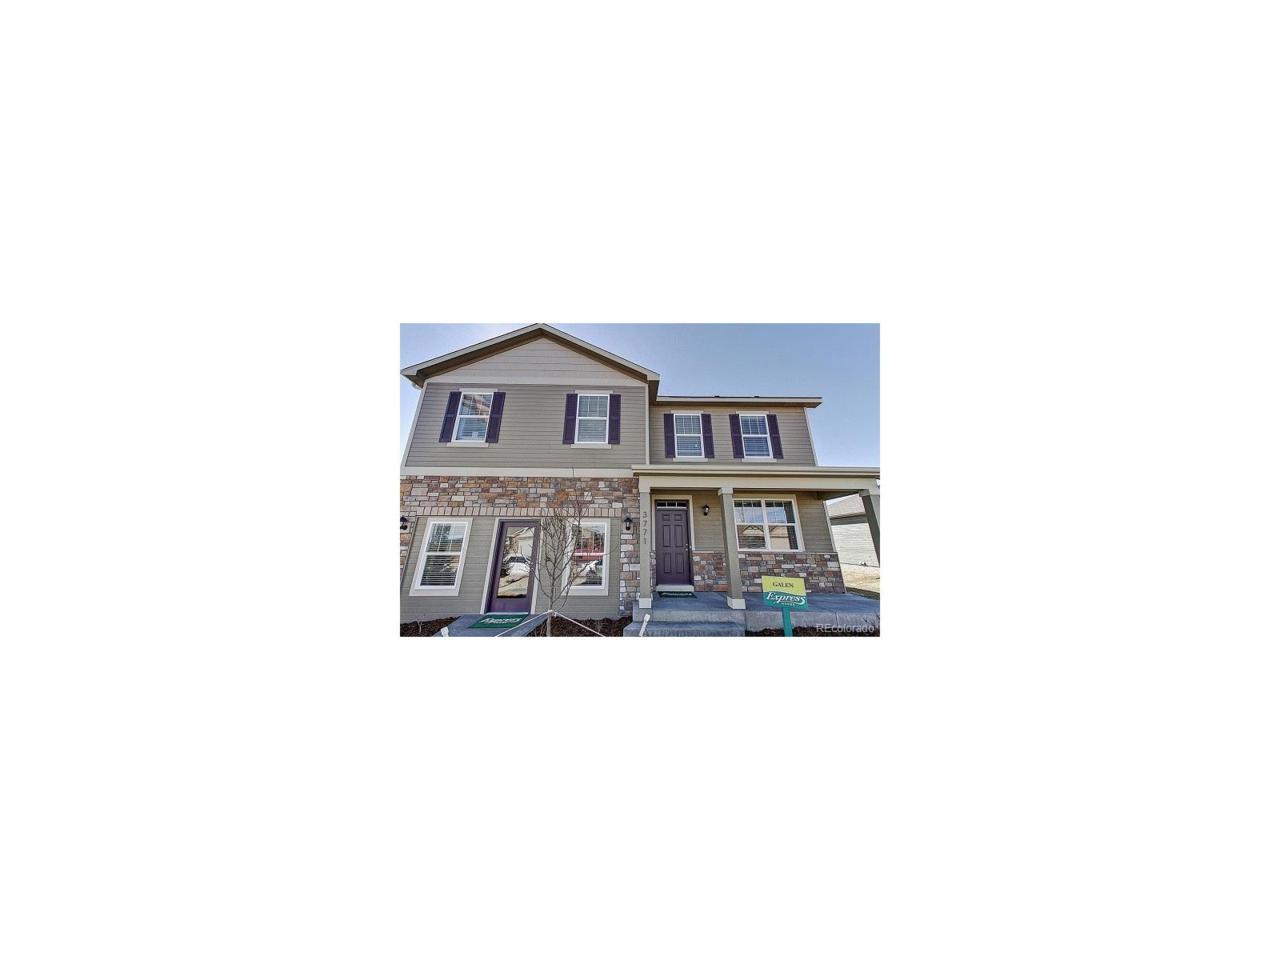 1533 Mcmurdo Trail, Castle Rock, CO 80108 (MLS #3209774) :: 8z Real Estate